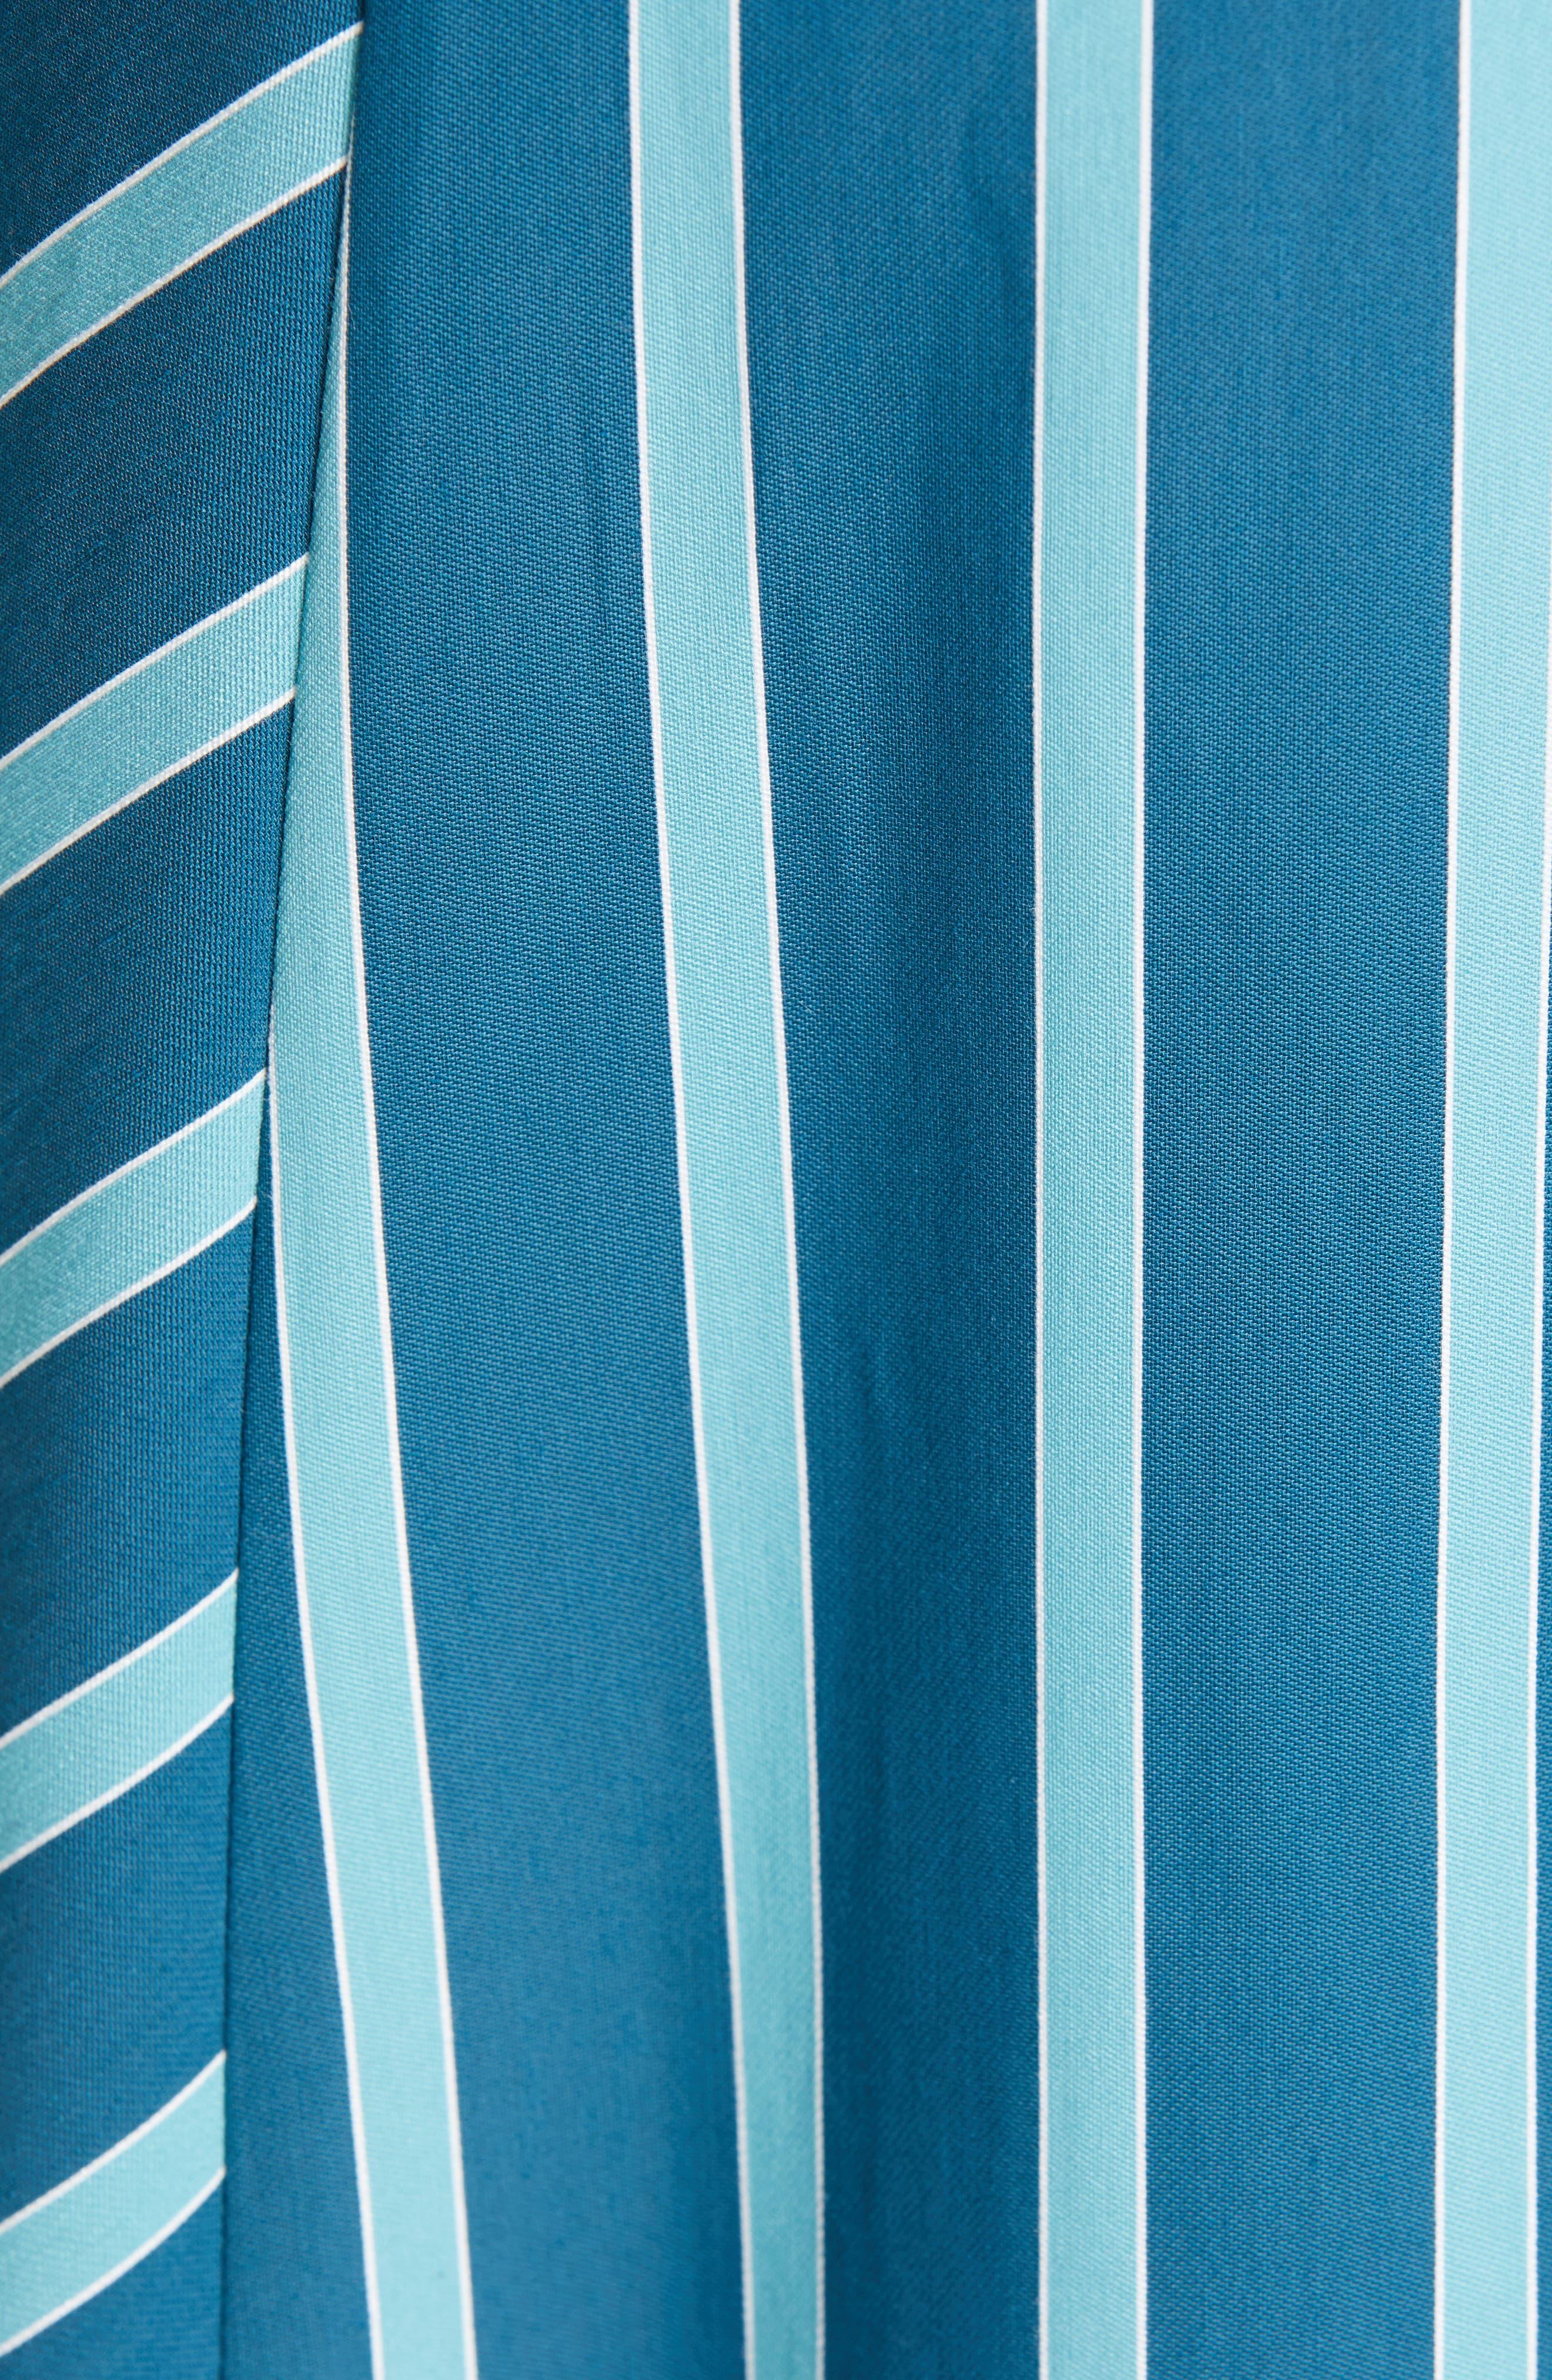 LAFAYETTE 148 NEW YORK, Siri Wrap Dress, Alternate thumbnail 6, color, PACIFIC MULTI